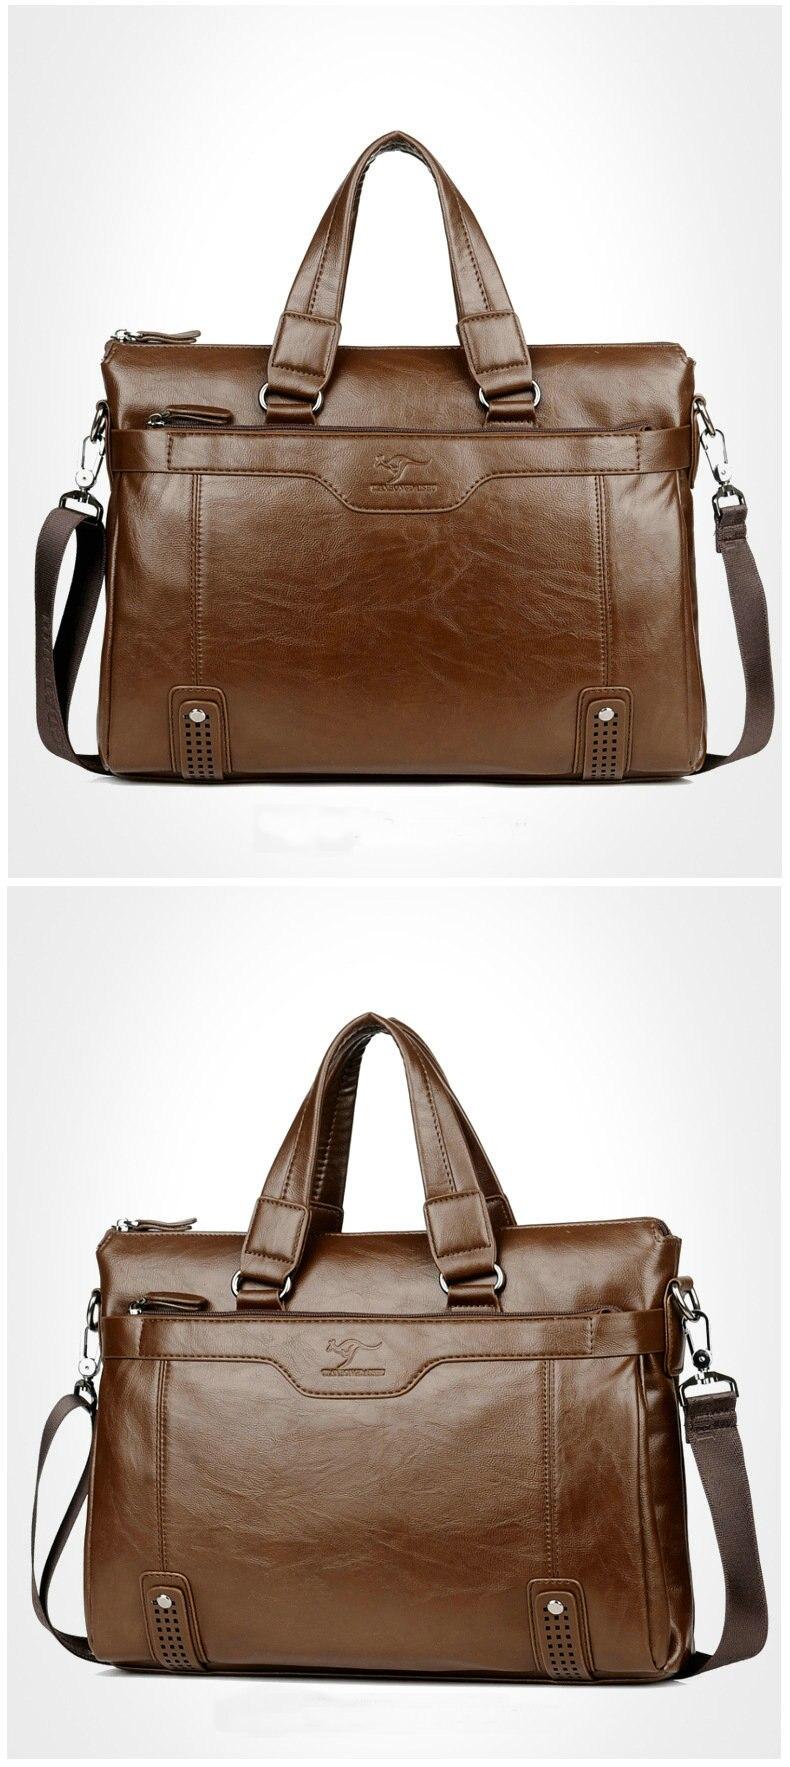 HTB1t3tzelWD3KVjSZFsq6AqkpXar Cowhide Leather men's Briefcase men laptop male messenger bag Men's shoulder bags briefcases for documents bag